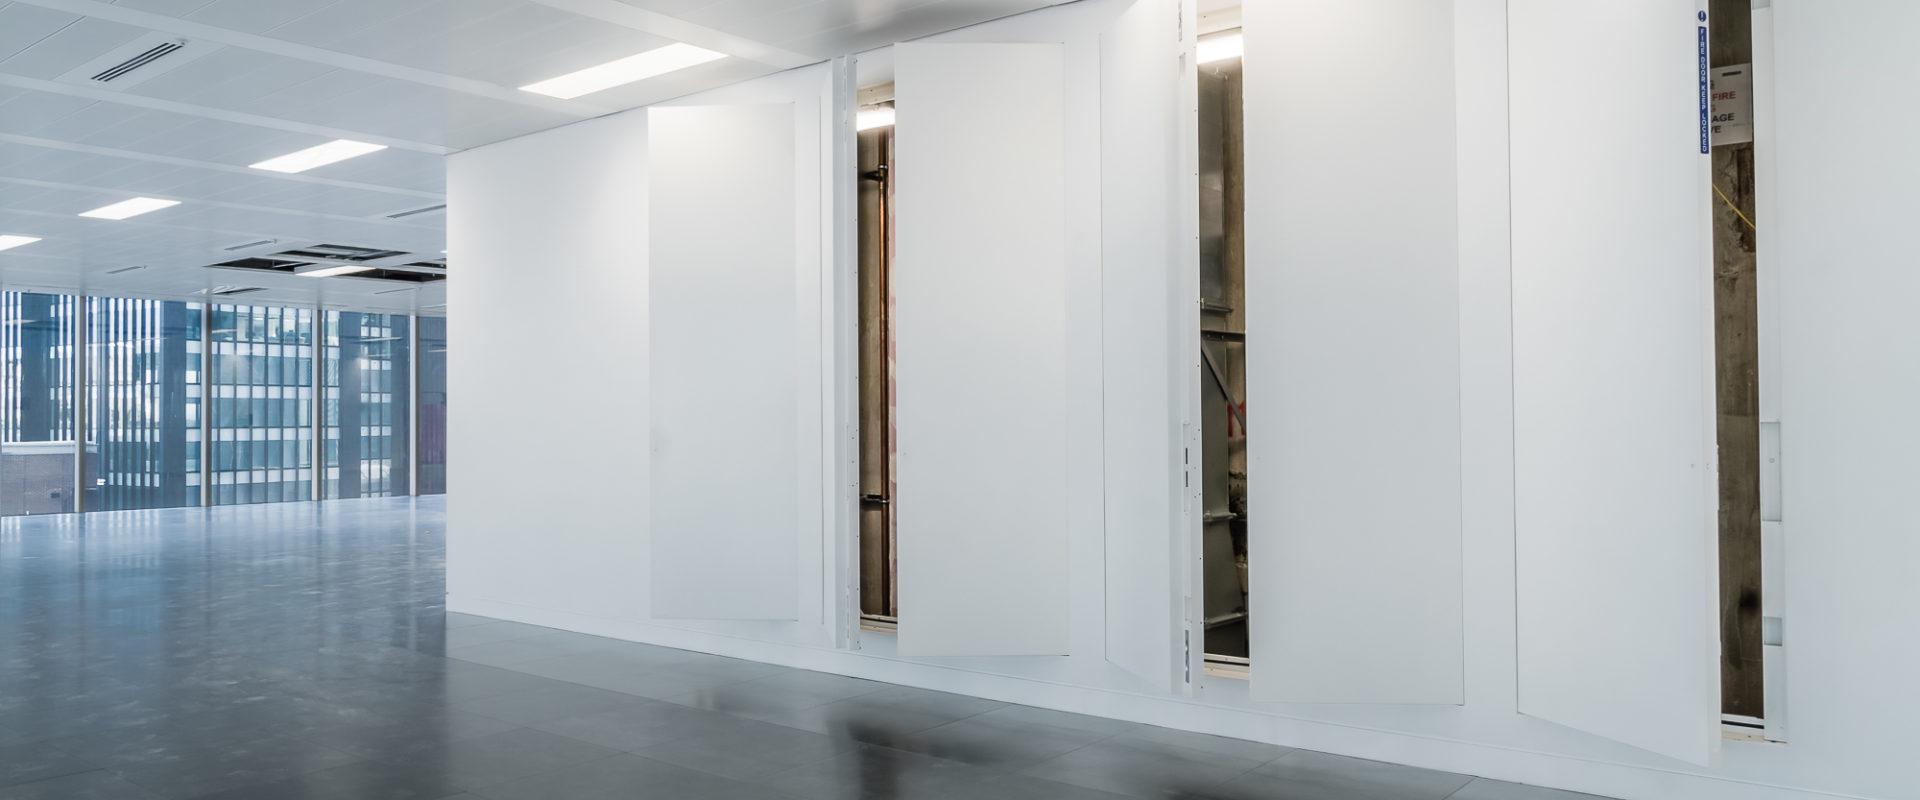 Christo Riser Doors Ajar